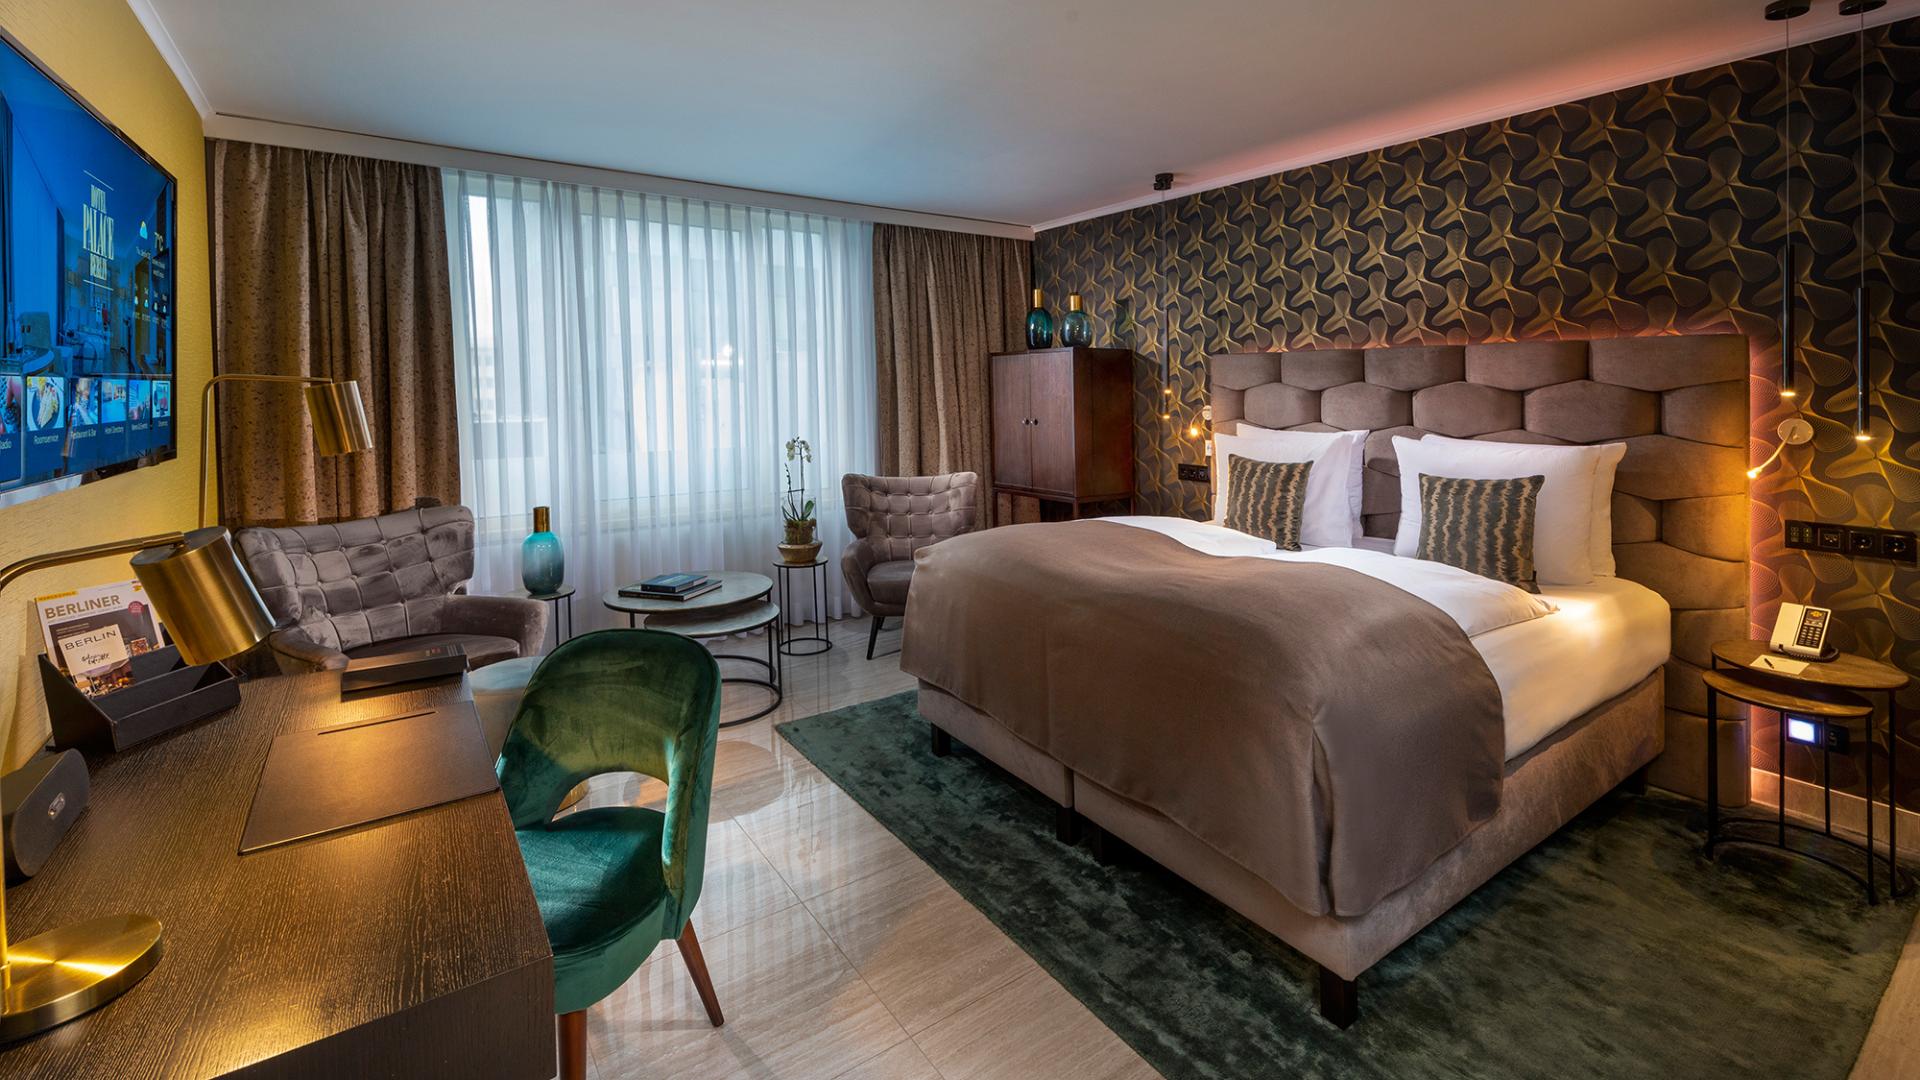 Luxushotels-im-Portr-t-Hotel-Palace-Berlin